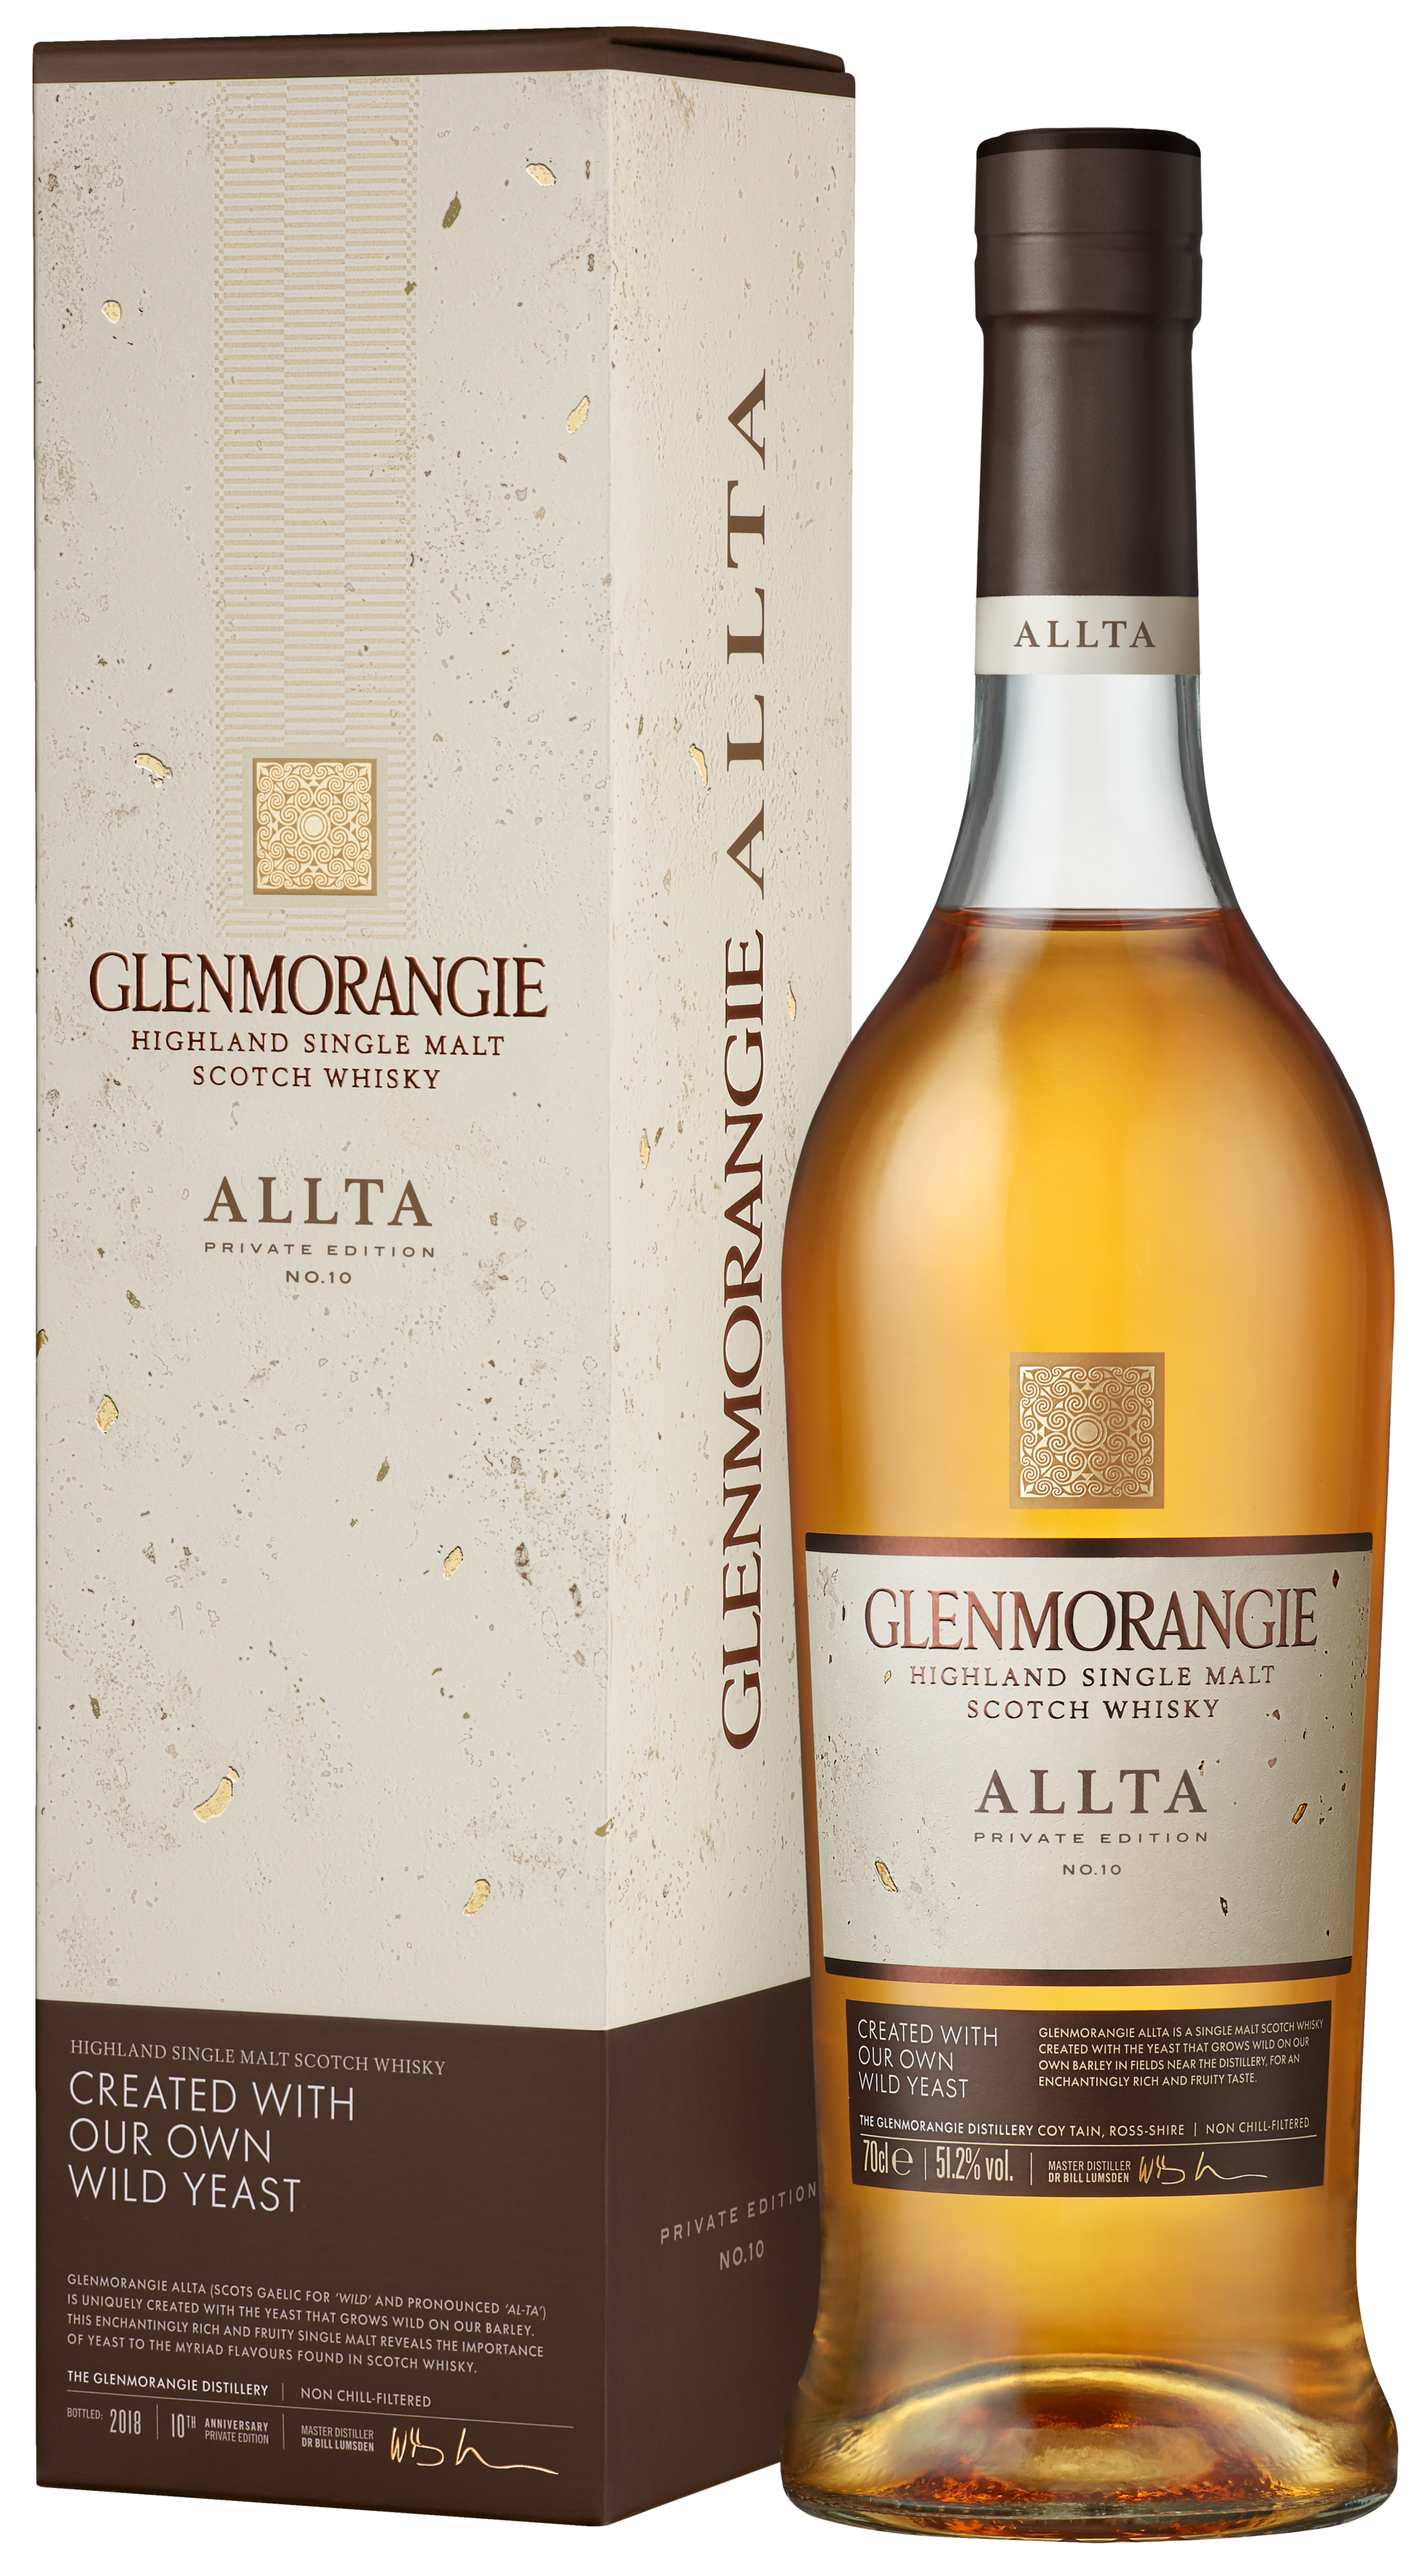 Glenmorangie Allta 01